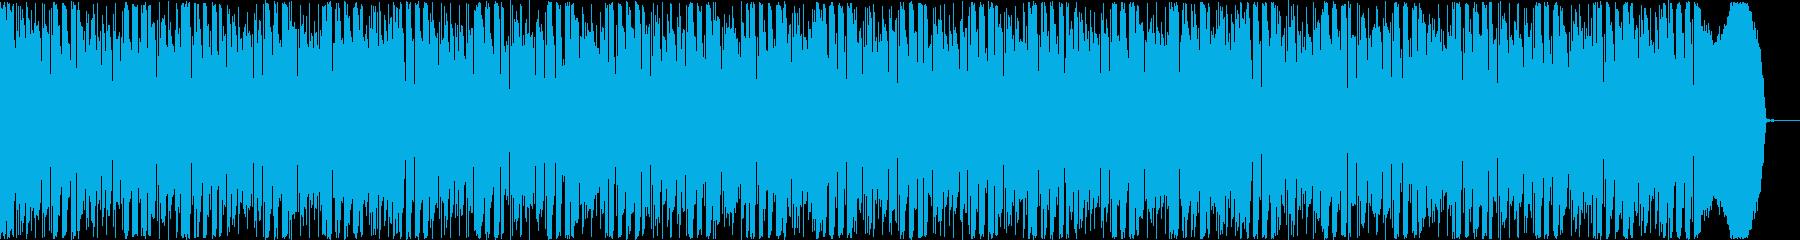 Funk, games, excitement's reproduced waveform